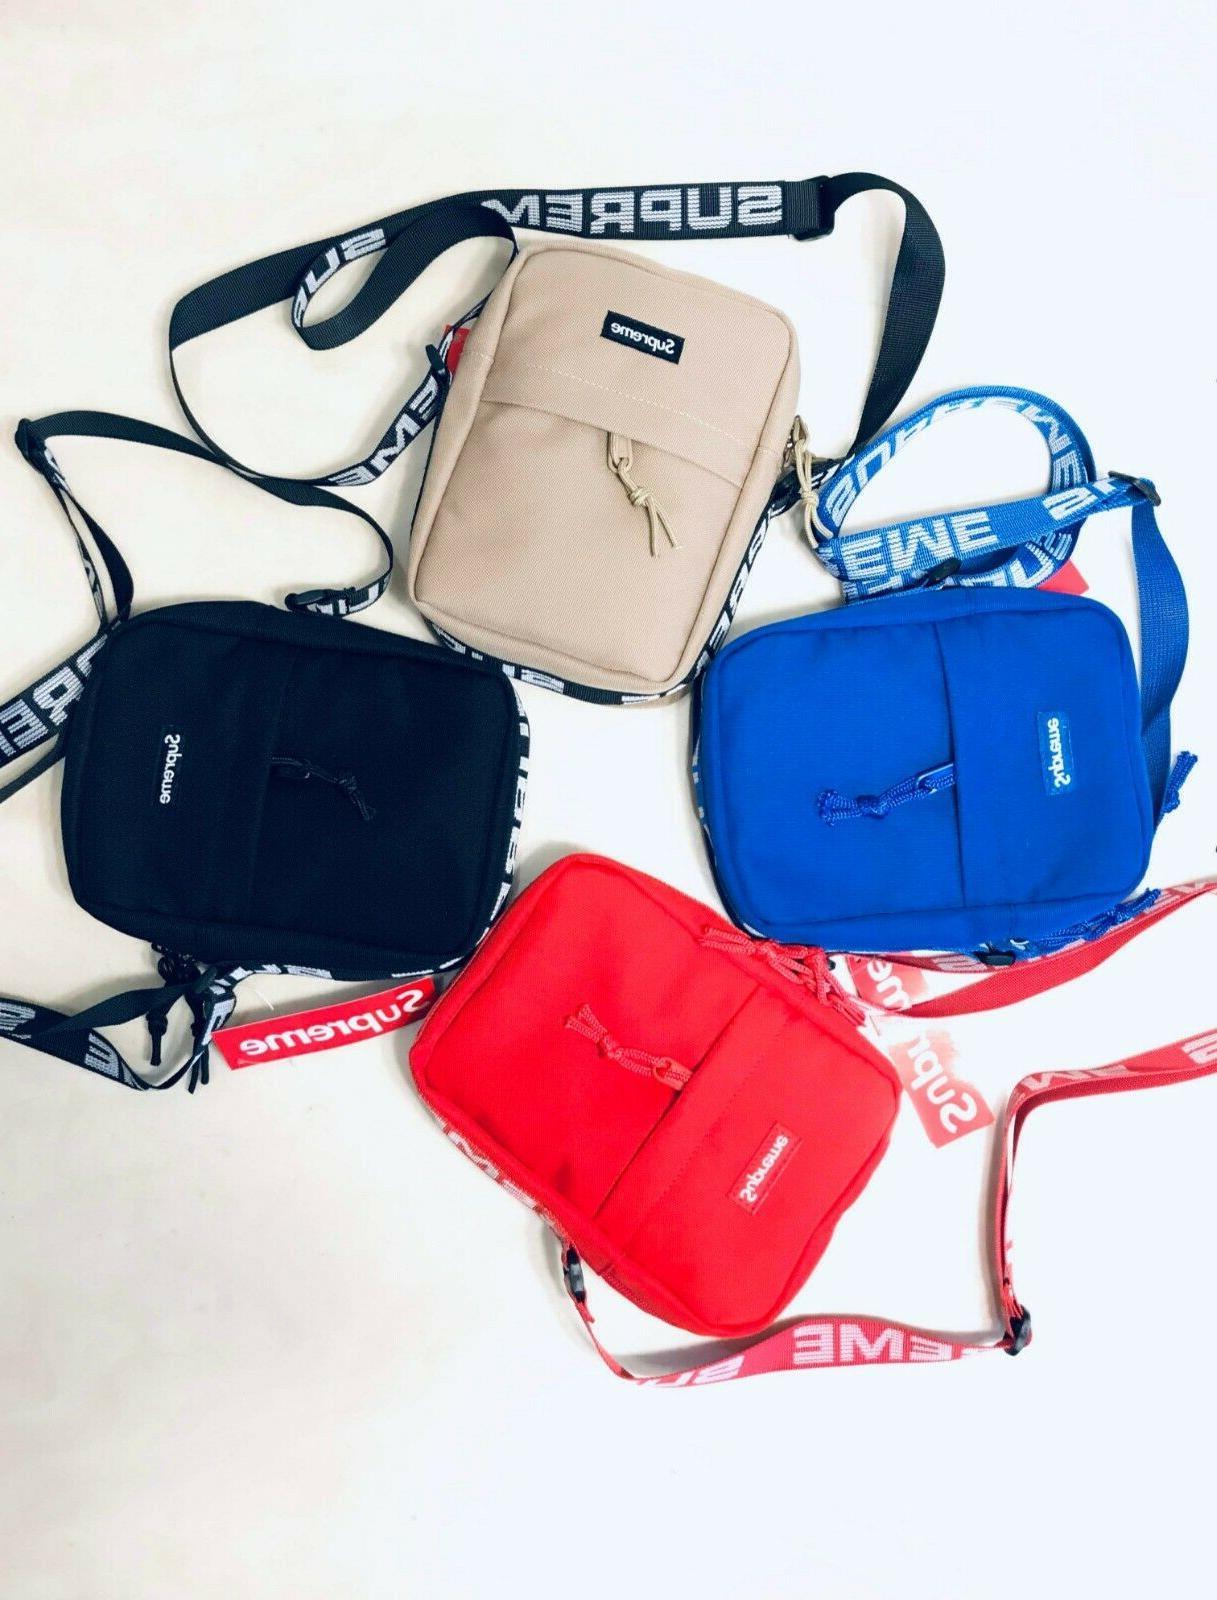 new shoulder bag ss18 unisex men woman